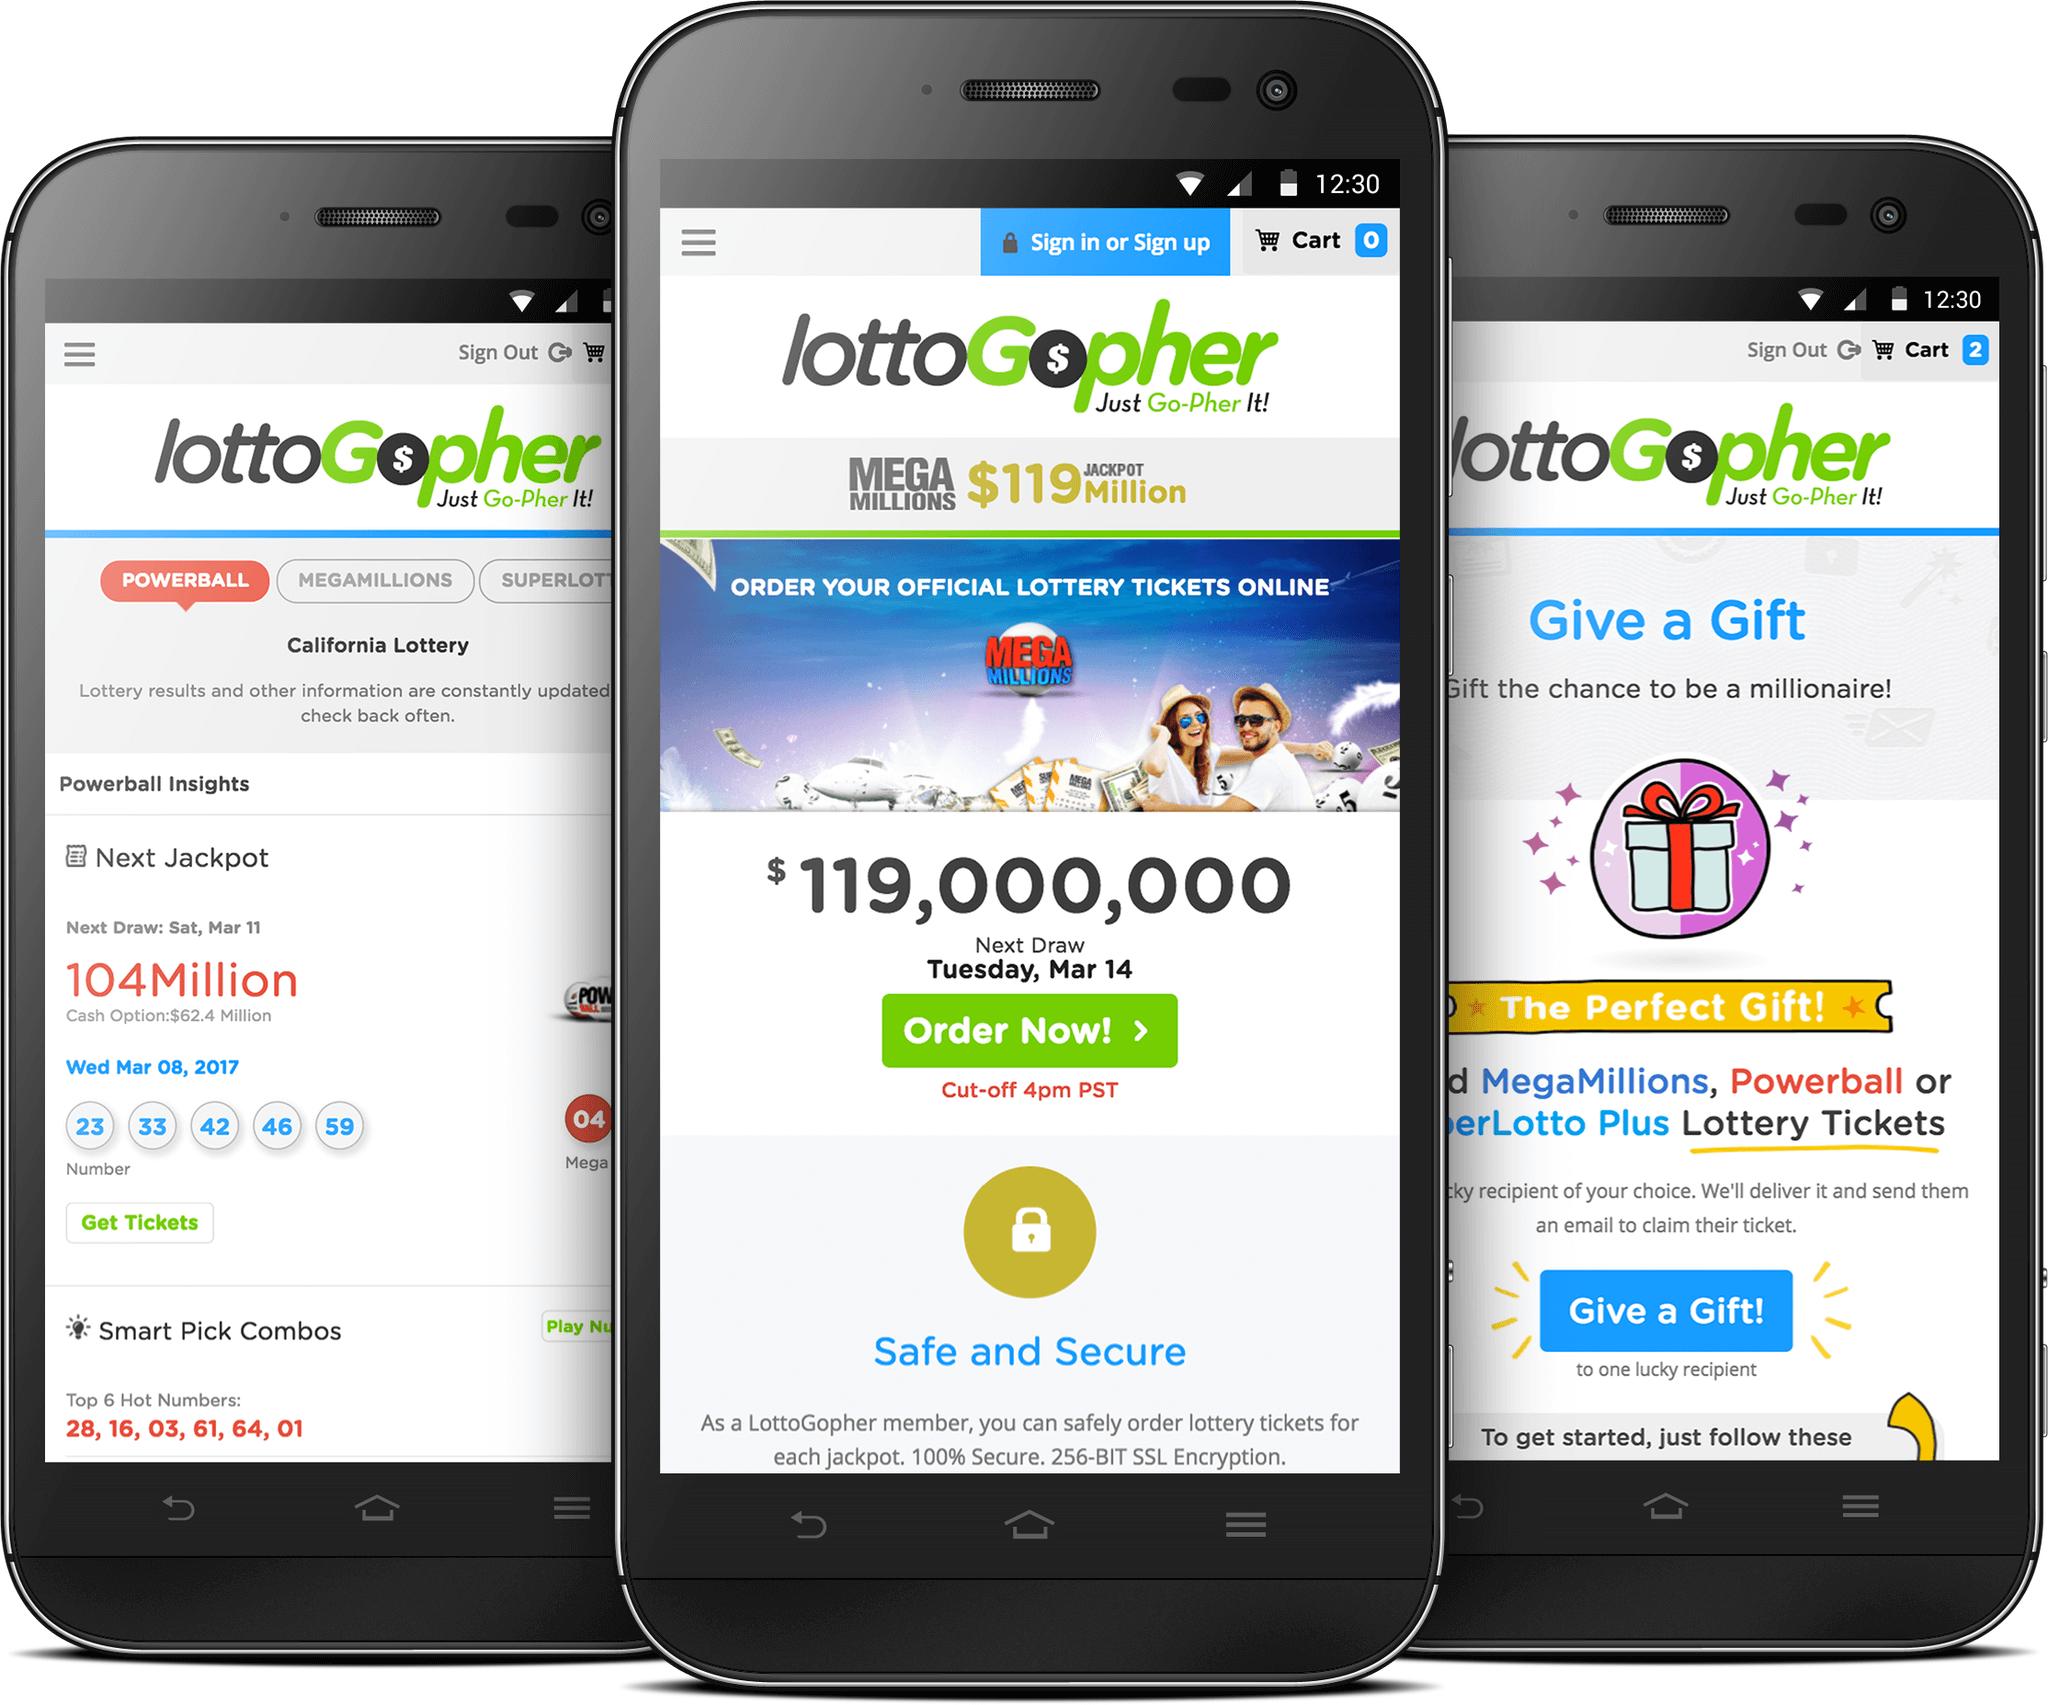 Lottogopher